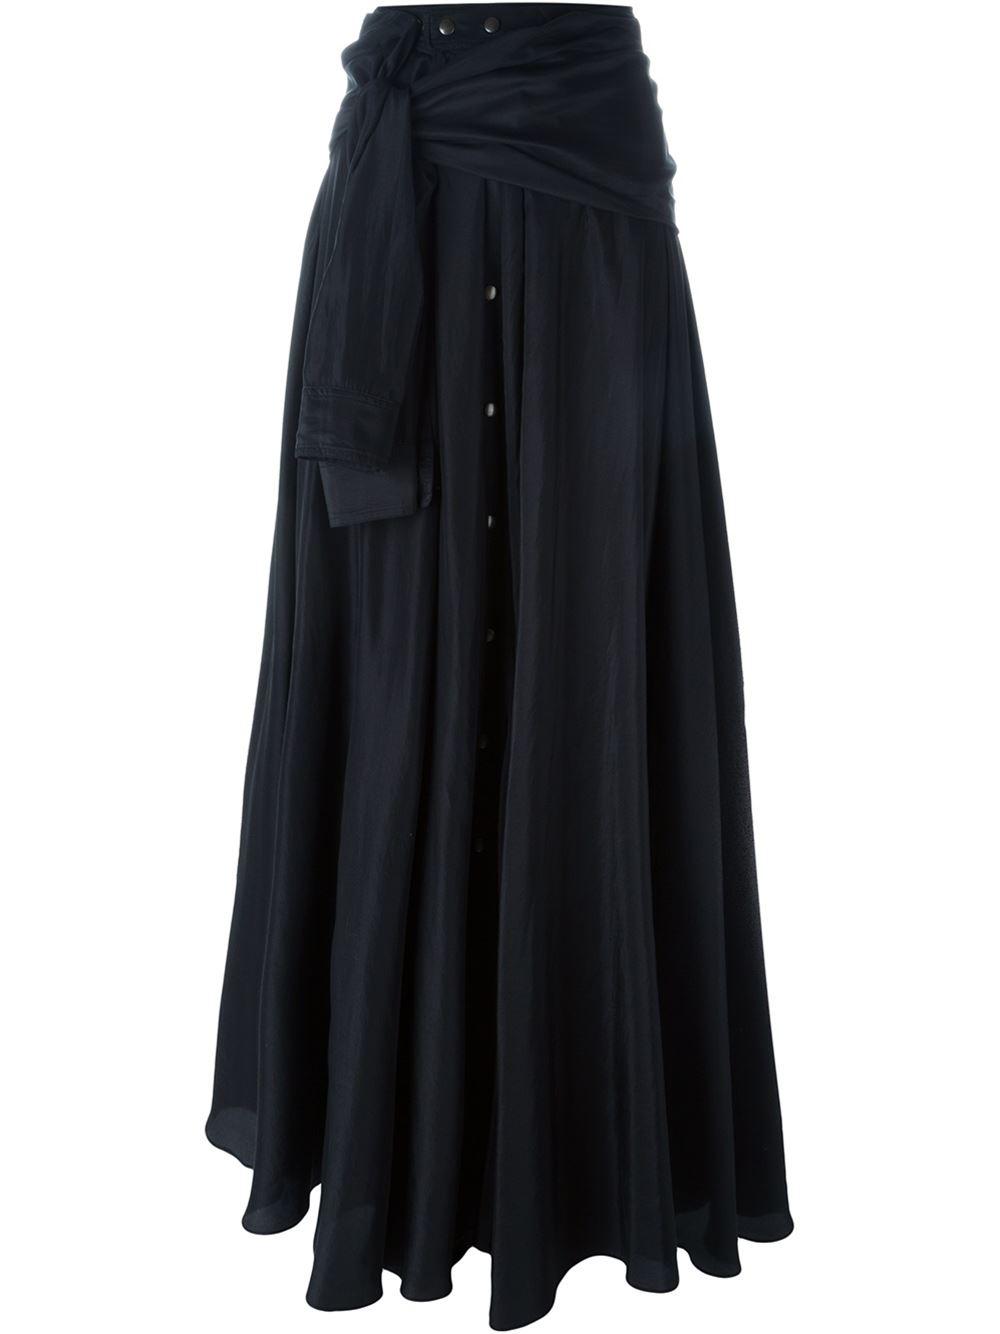 faith connexion shirt style maxi skirt in black save 31